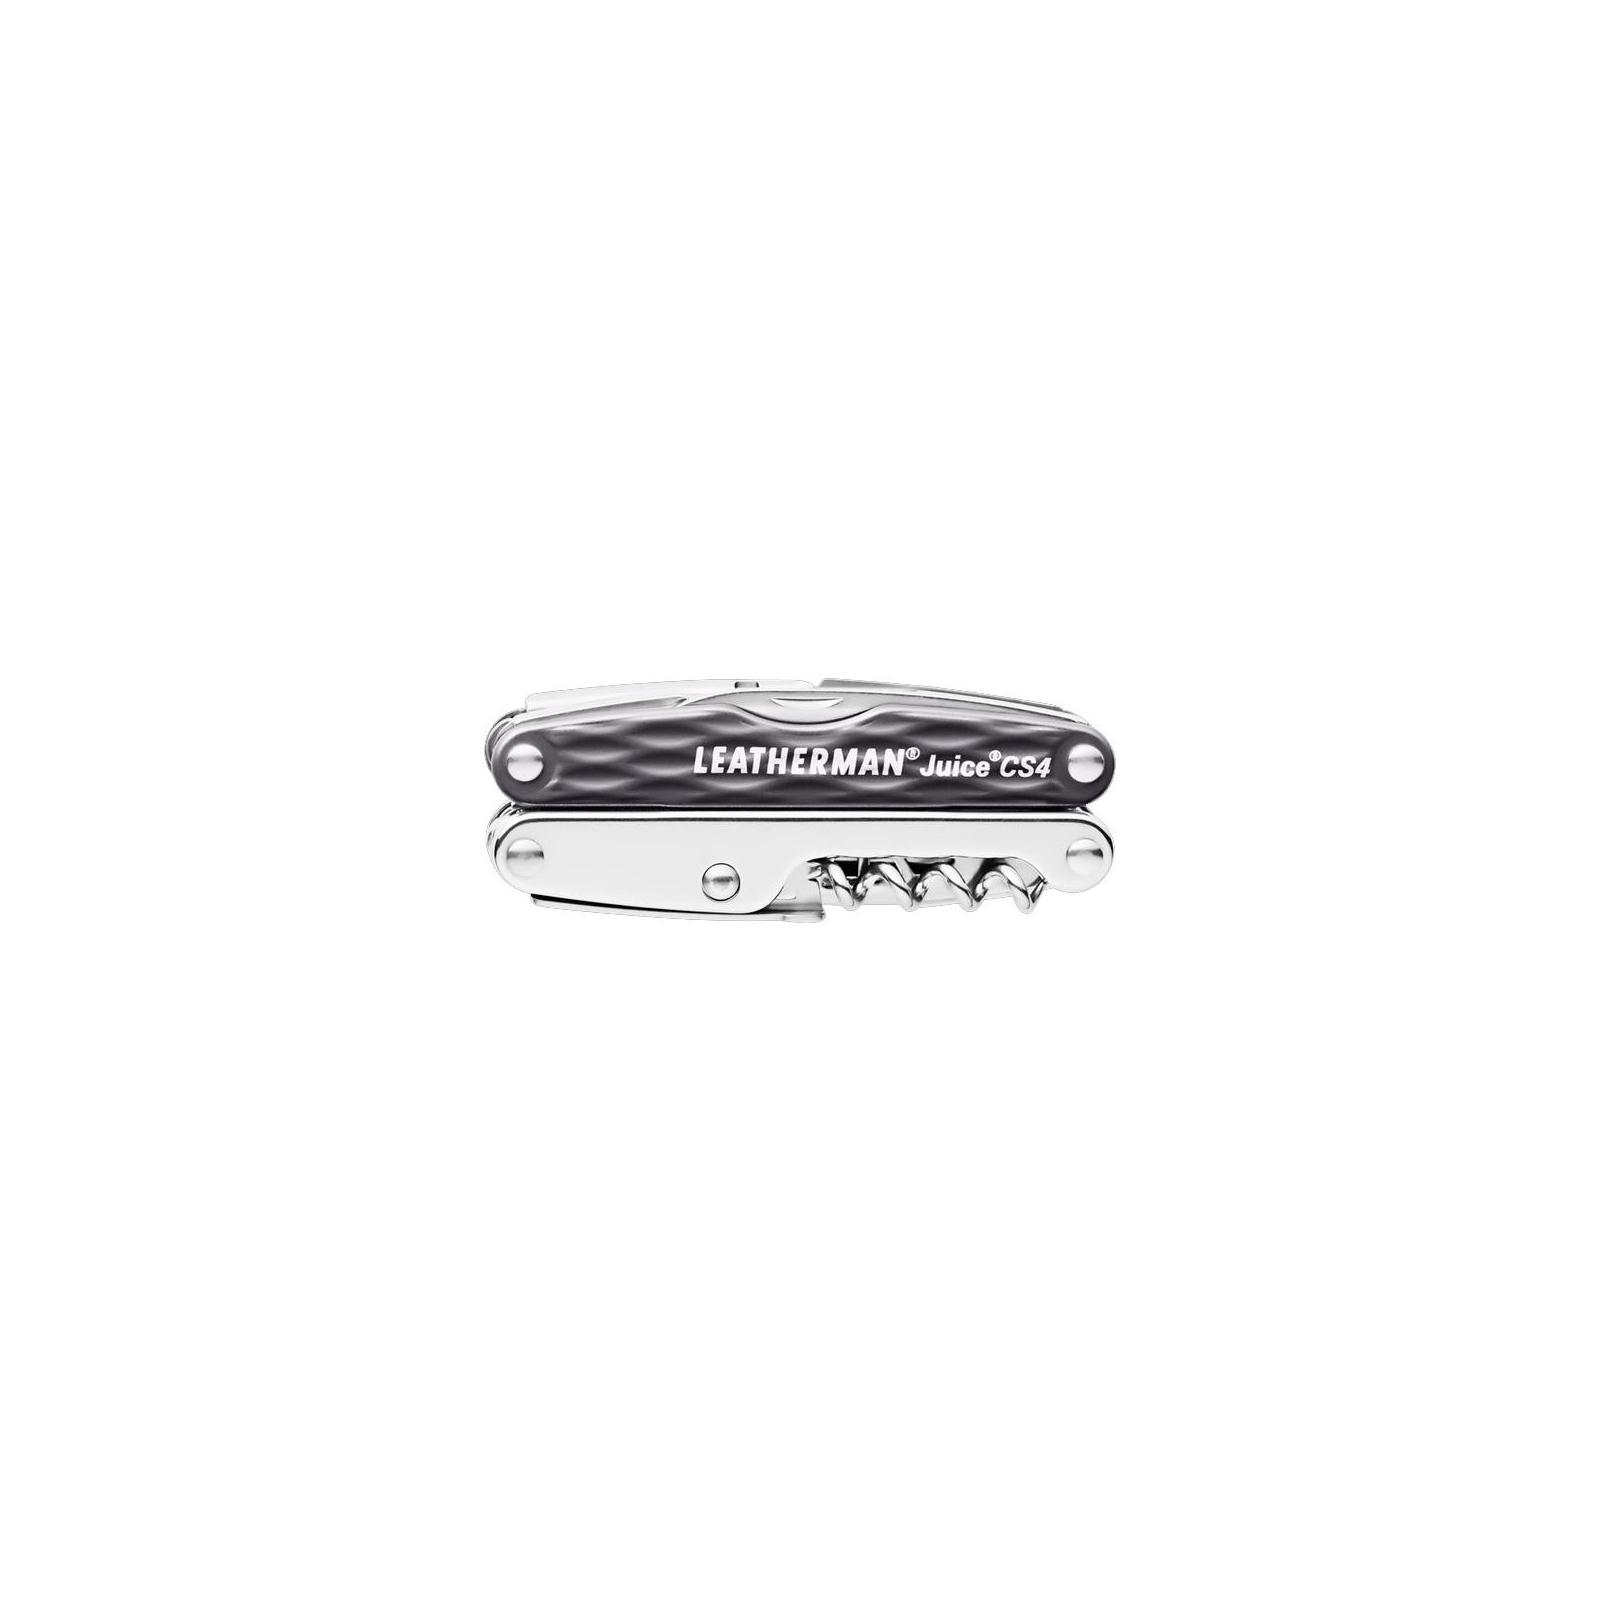 Мультитул Leatherman Juice CS4- GRANITE GRAY кожаный чехол (831940) изображение 3